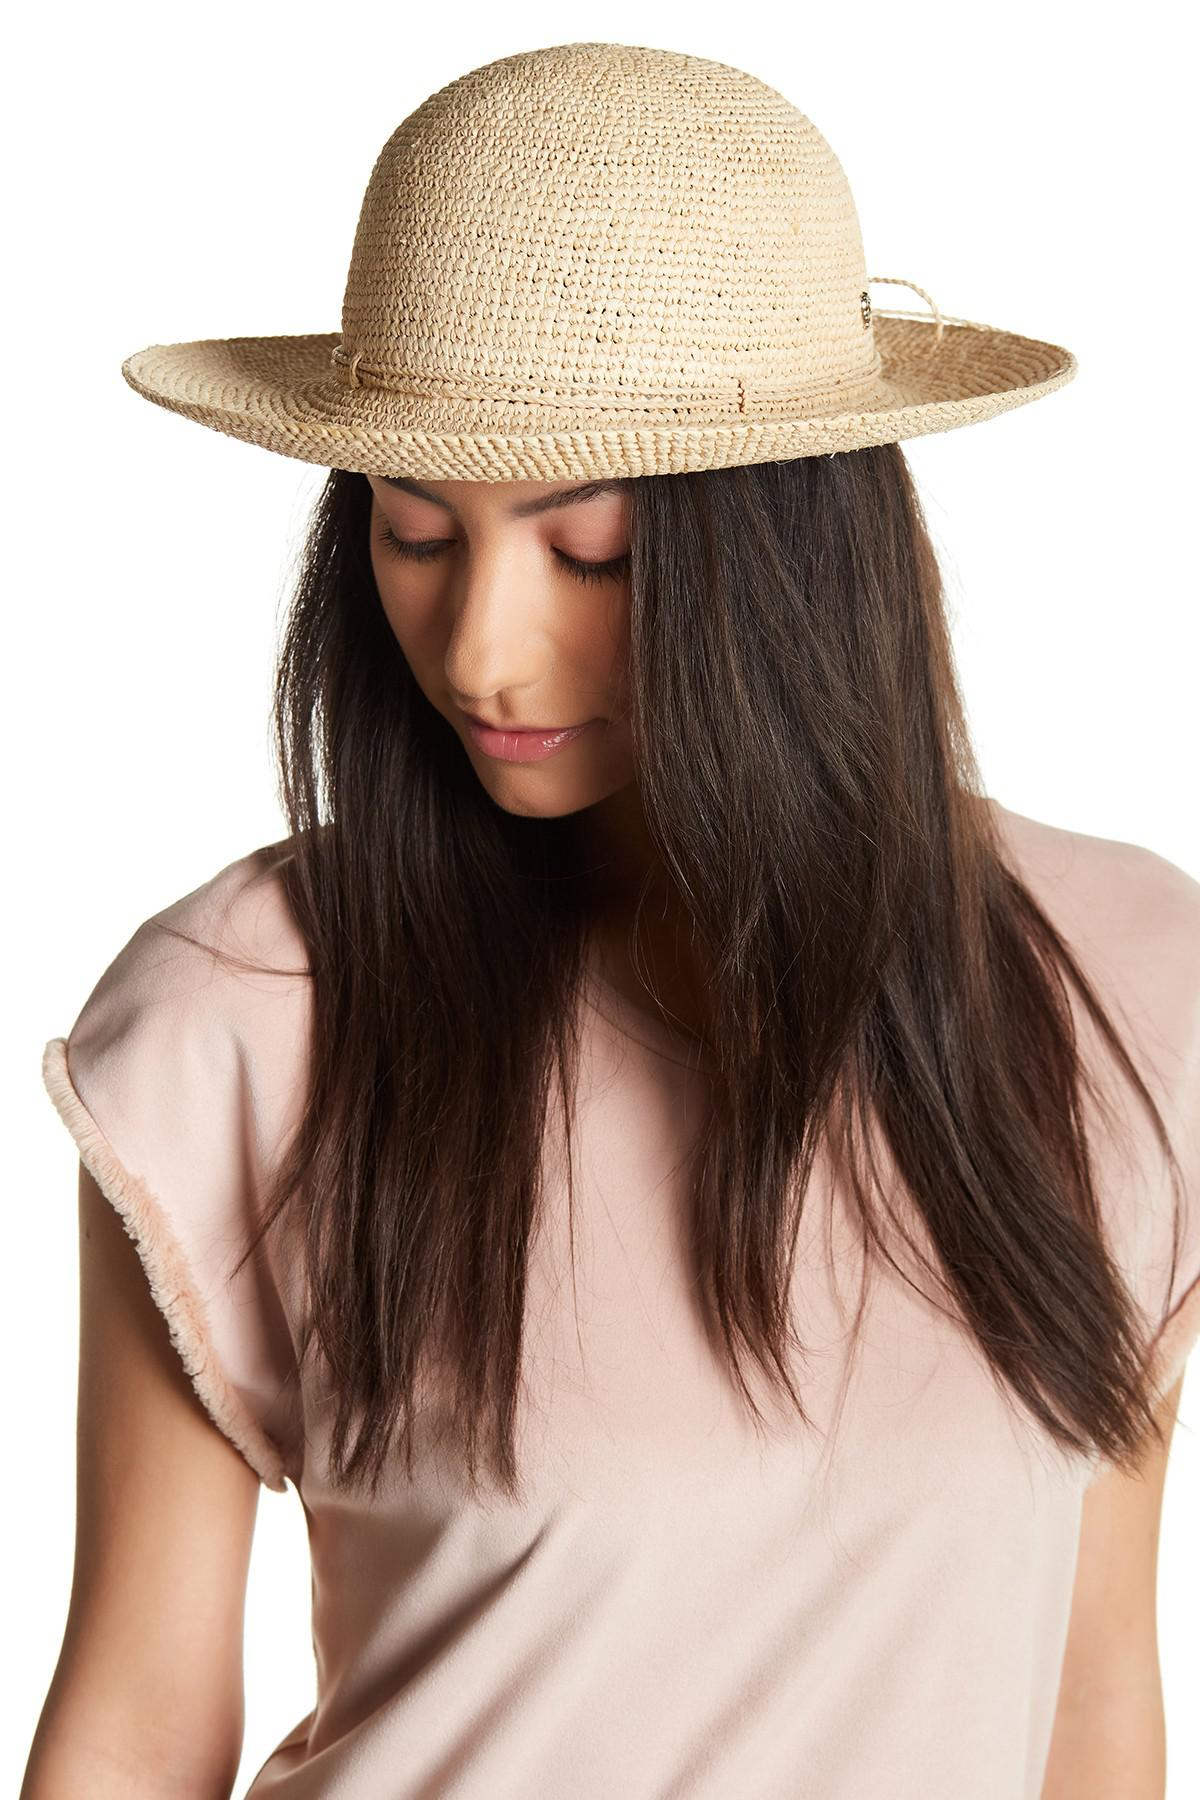 Lyst - Helen Kaminski Caicos Hat in Natural dc6dae471f91